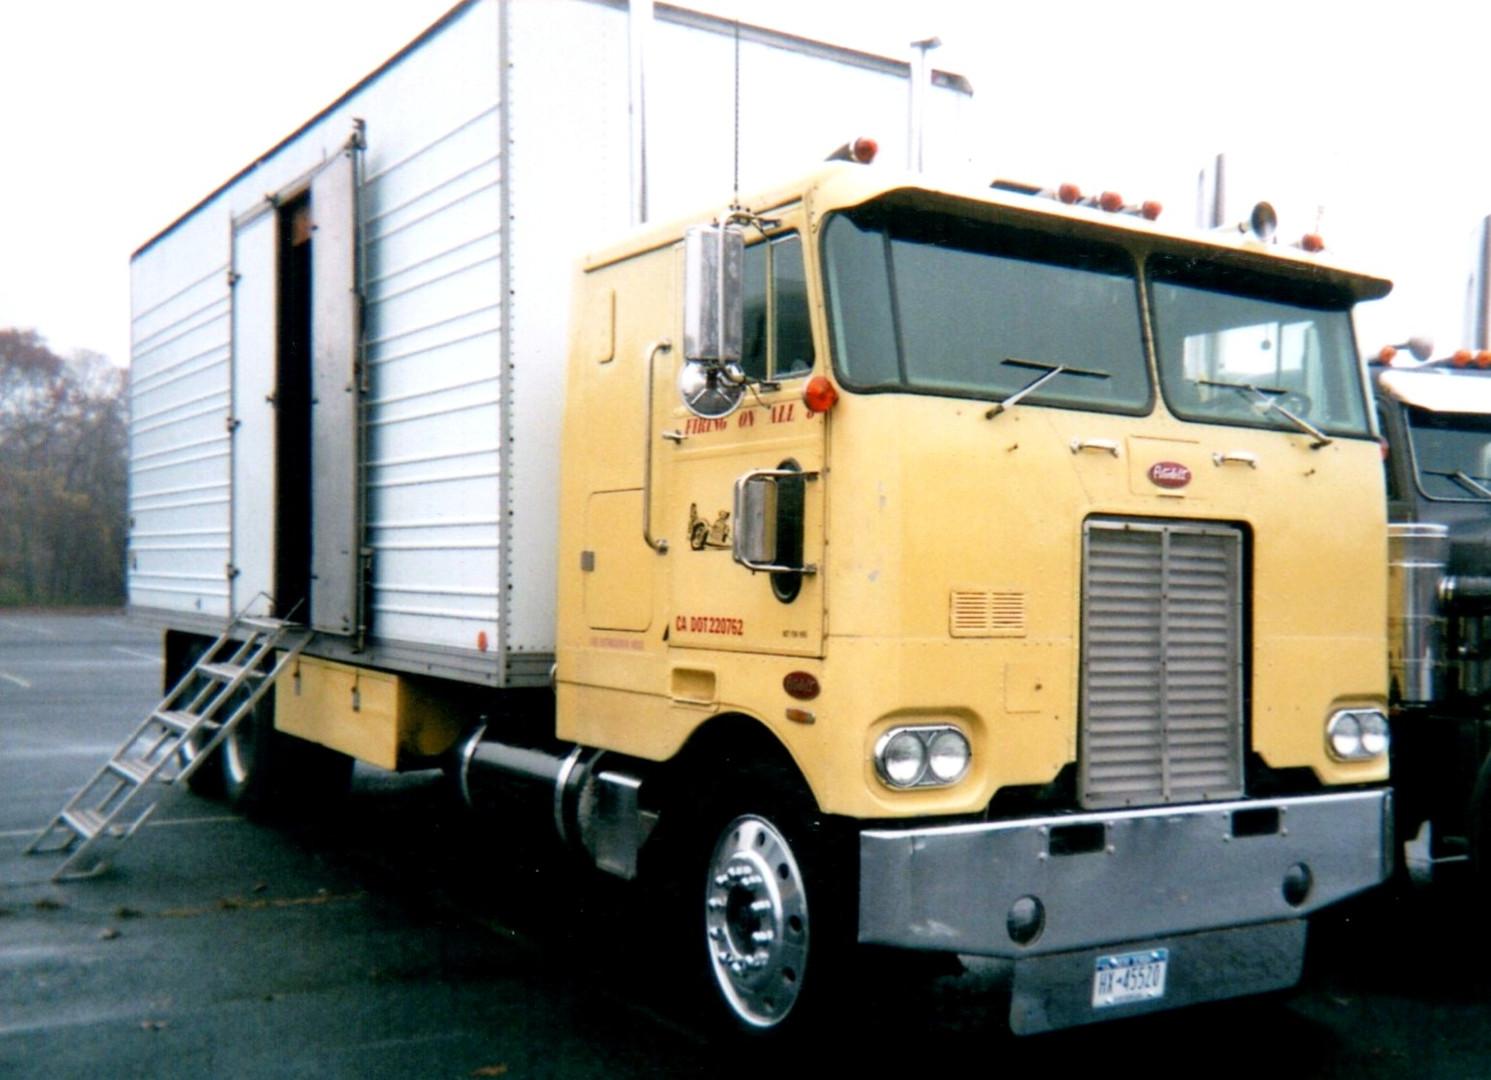 Mike Parkhill's 1971 Peterbilt 352 COE box truck